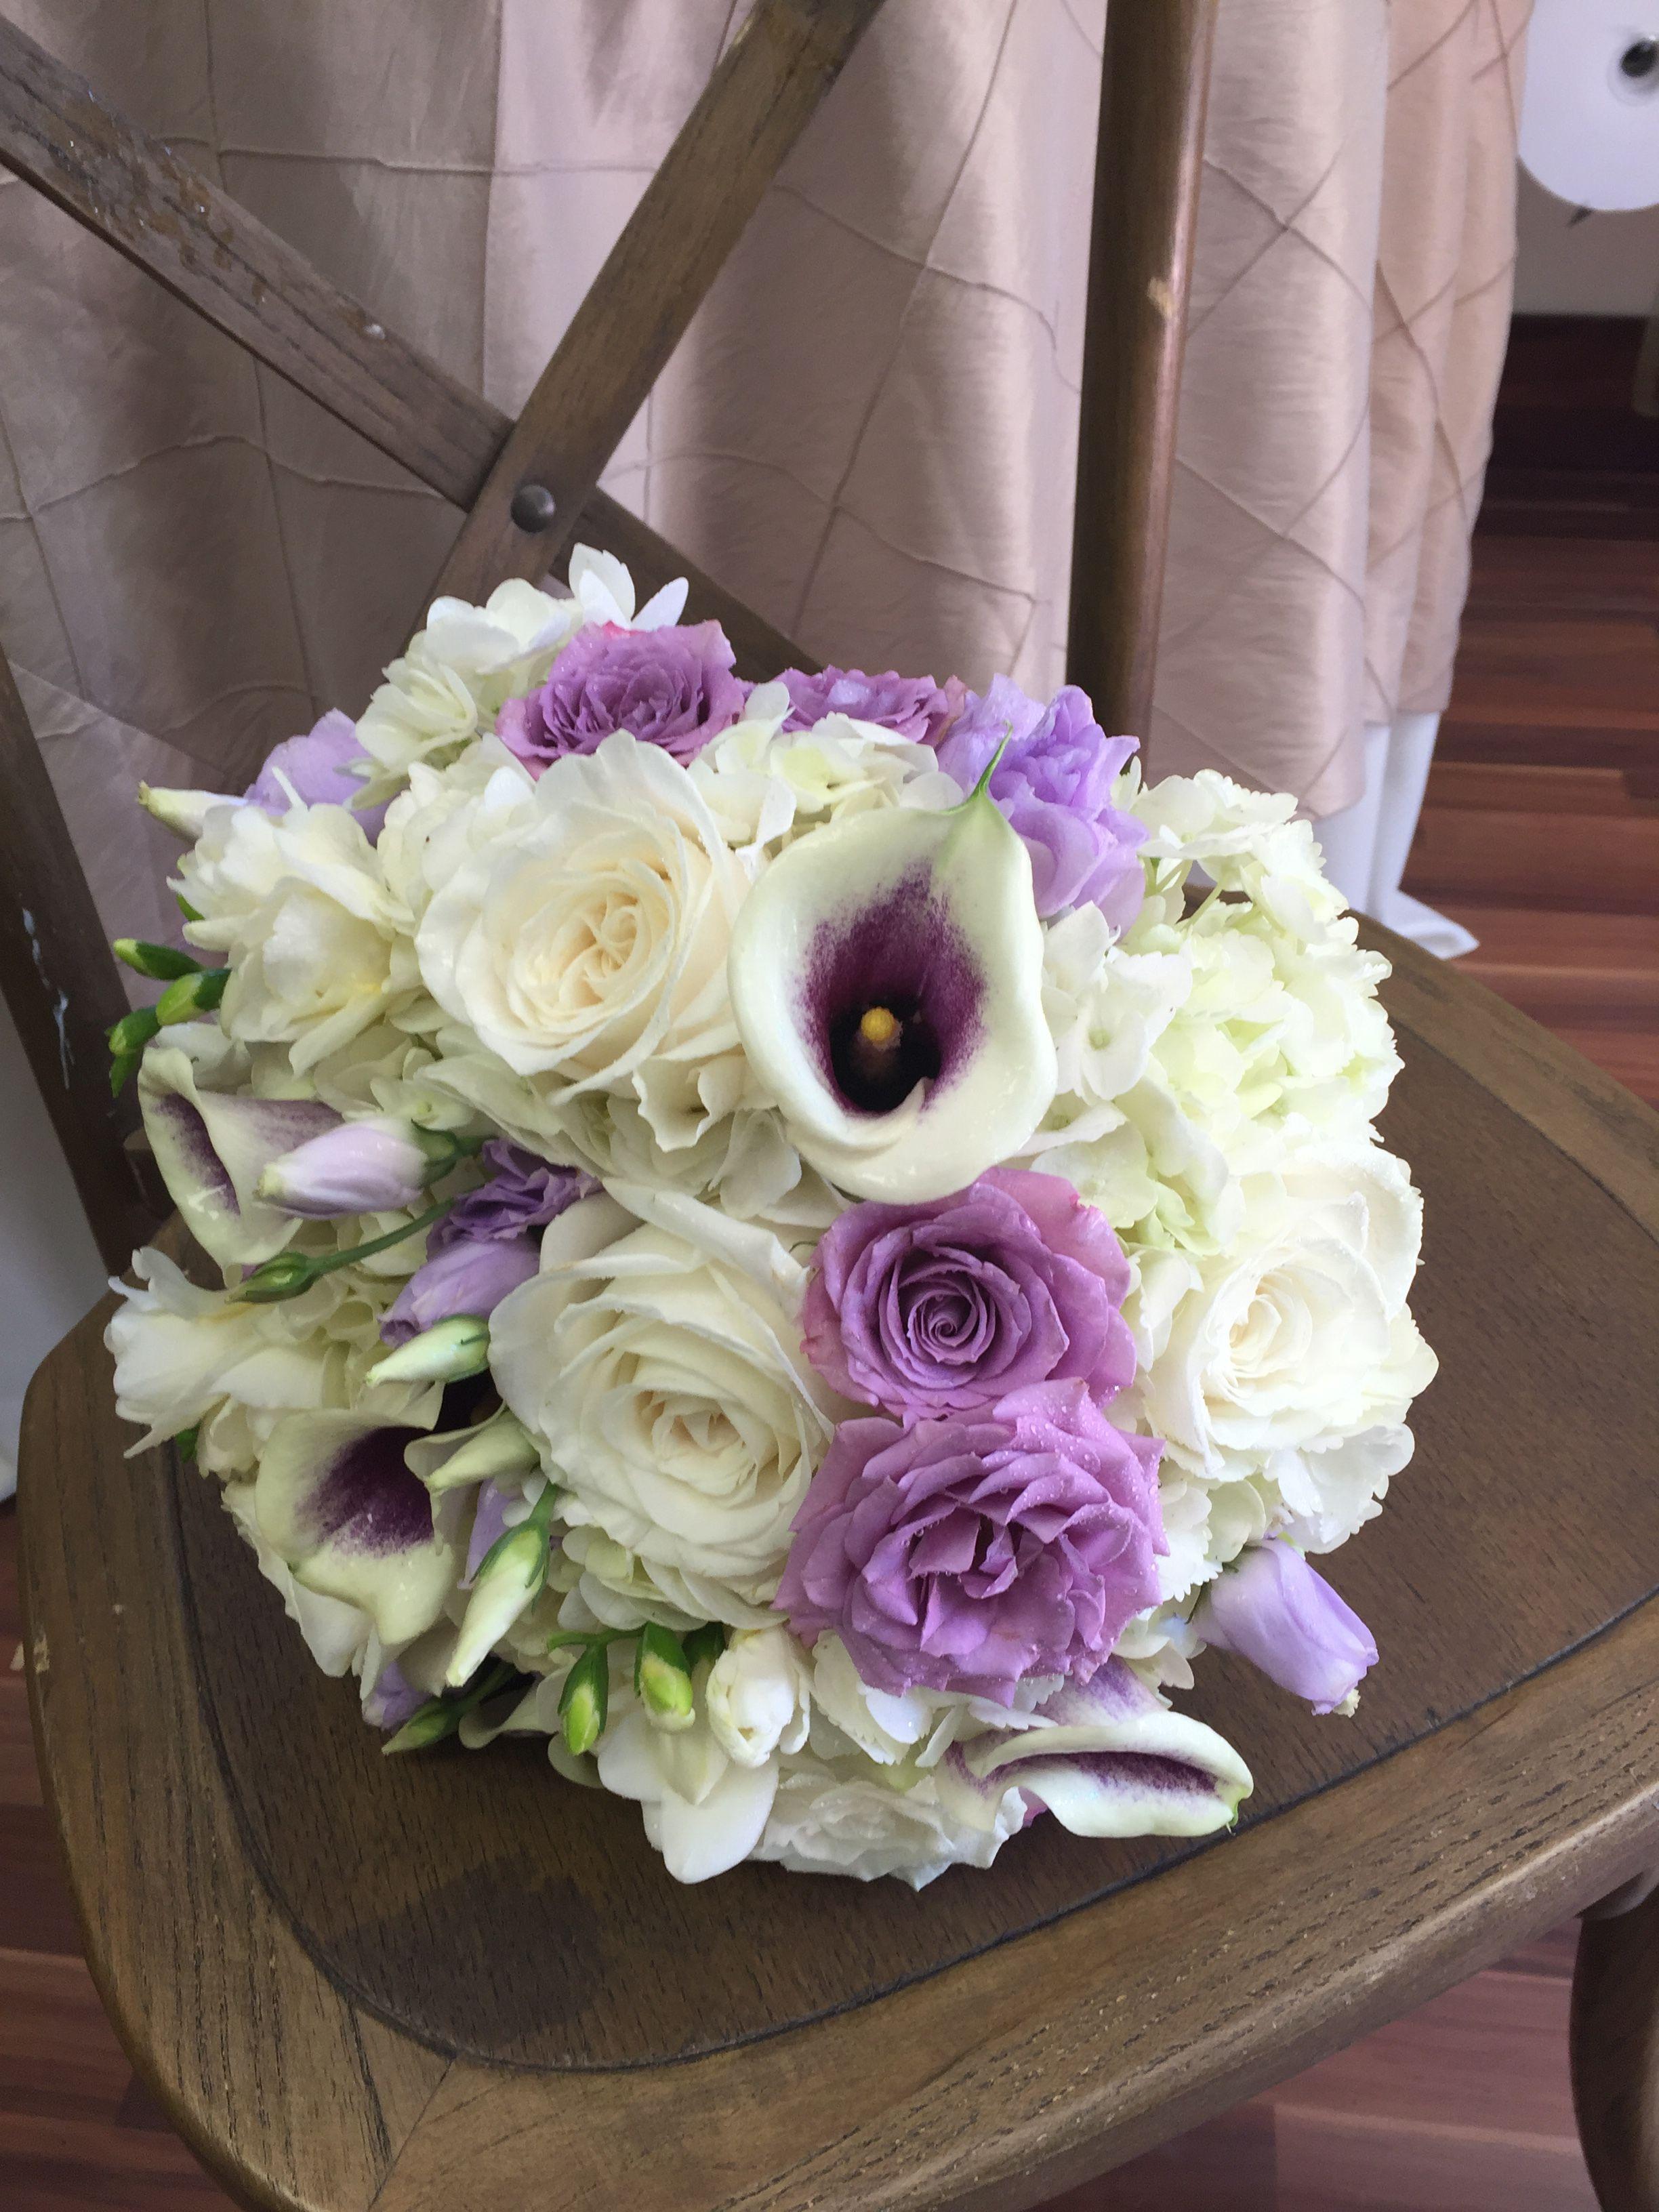 Confetti Weddings Confetti Events Exquisite Floral Event Decor Wedding Planning Flower Bouquet Wedding Wedding Confetti Wedding Bouquets